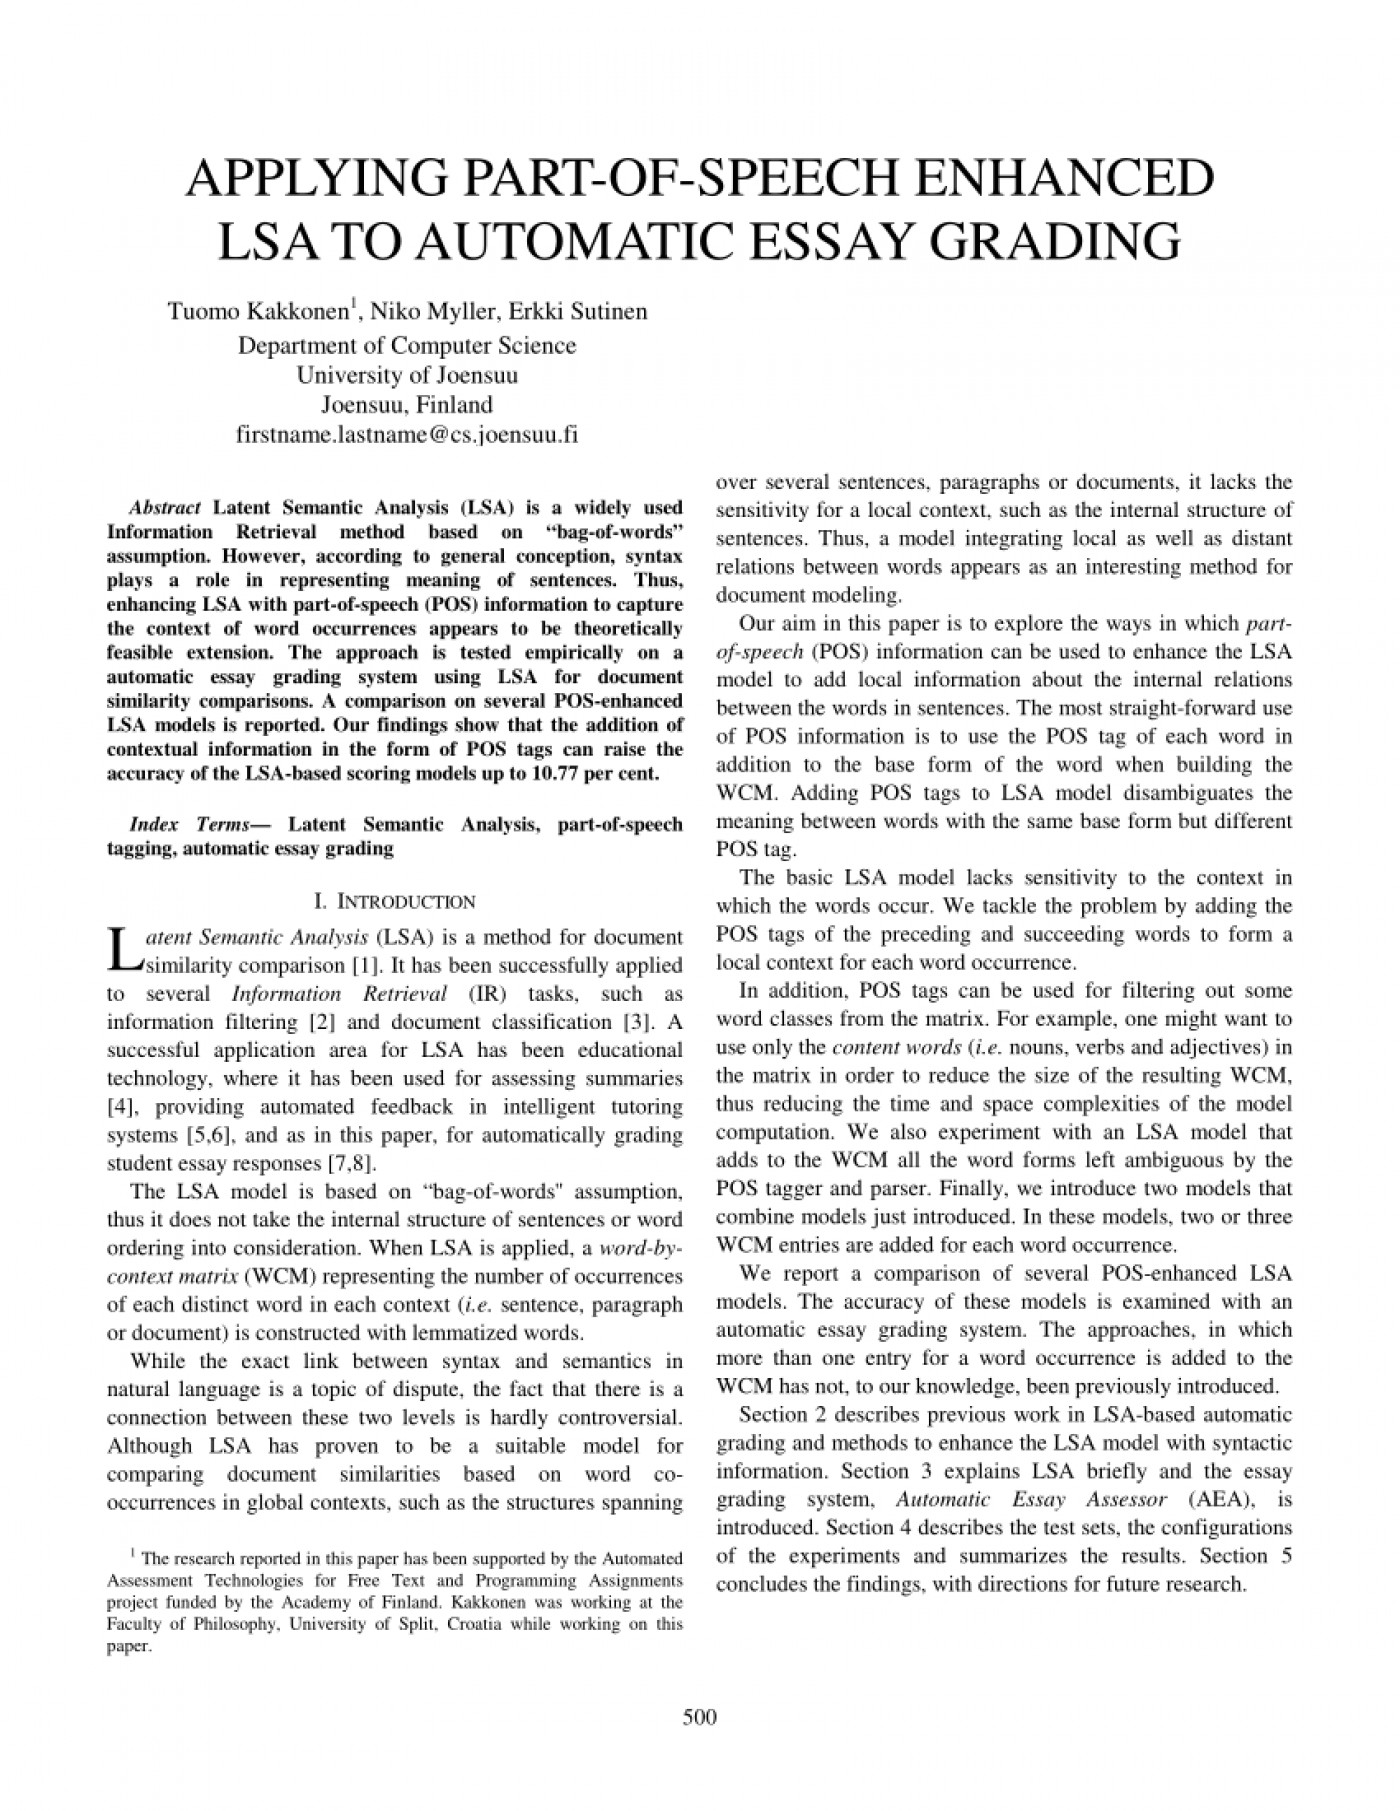 007 Automatic Essay Grader Free Example Singular 1400